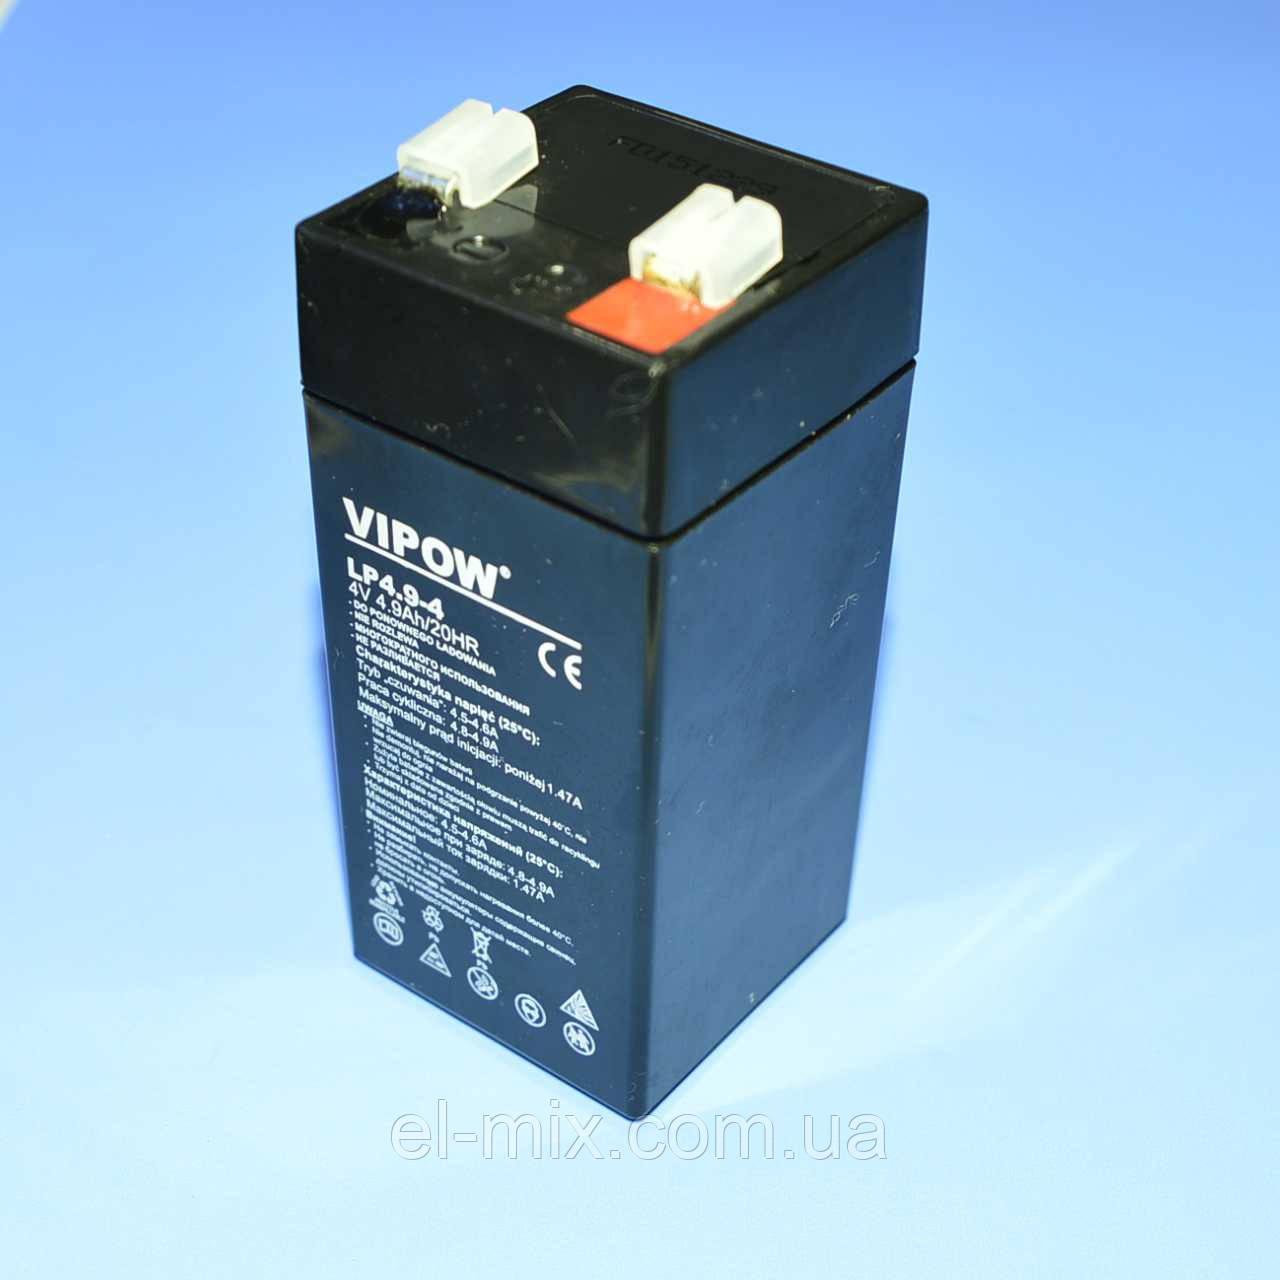 Аккумулятор гелевый Vipow  4V  4.9Ah  BAT0271  , фото 1